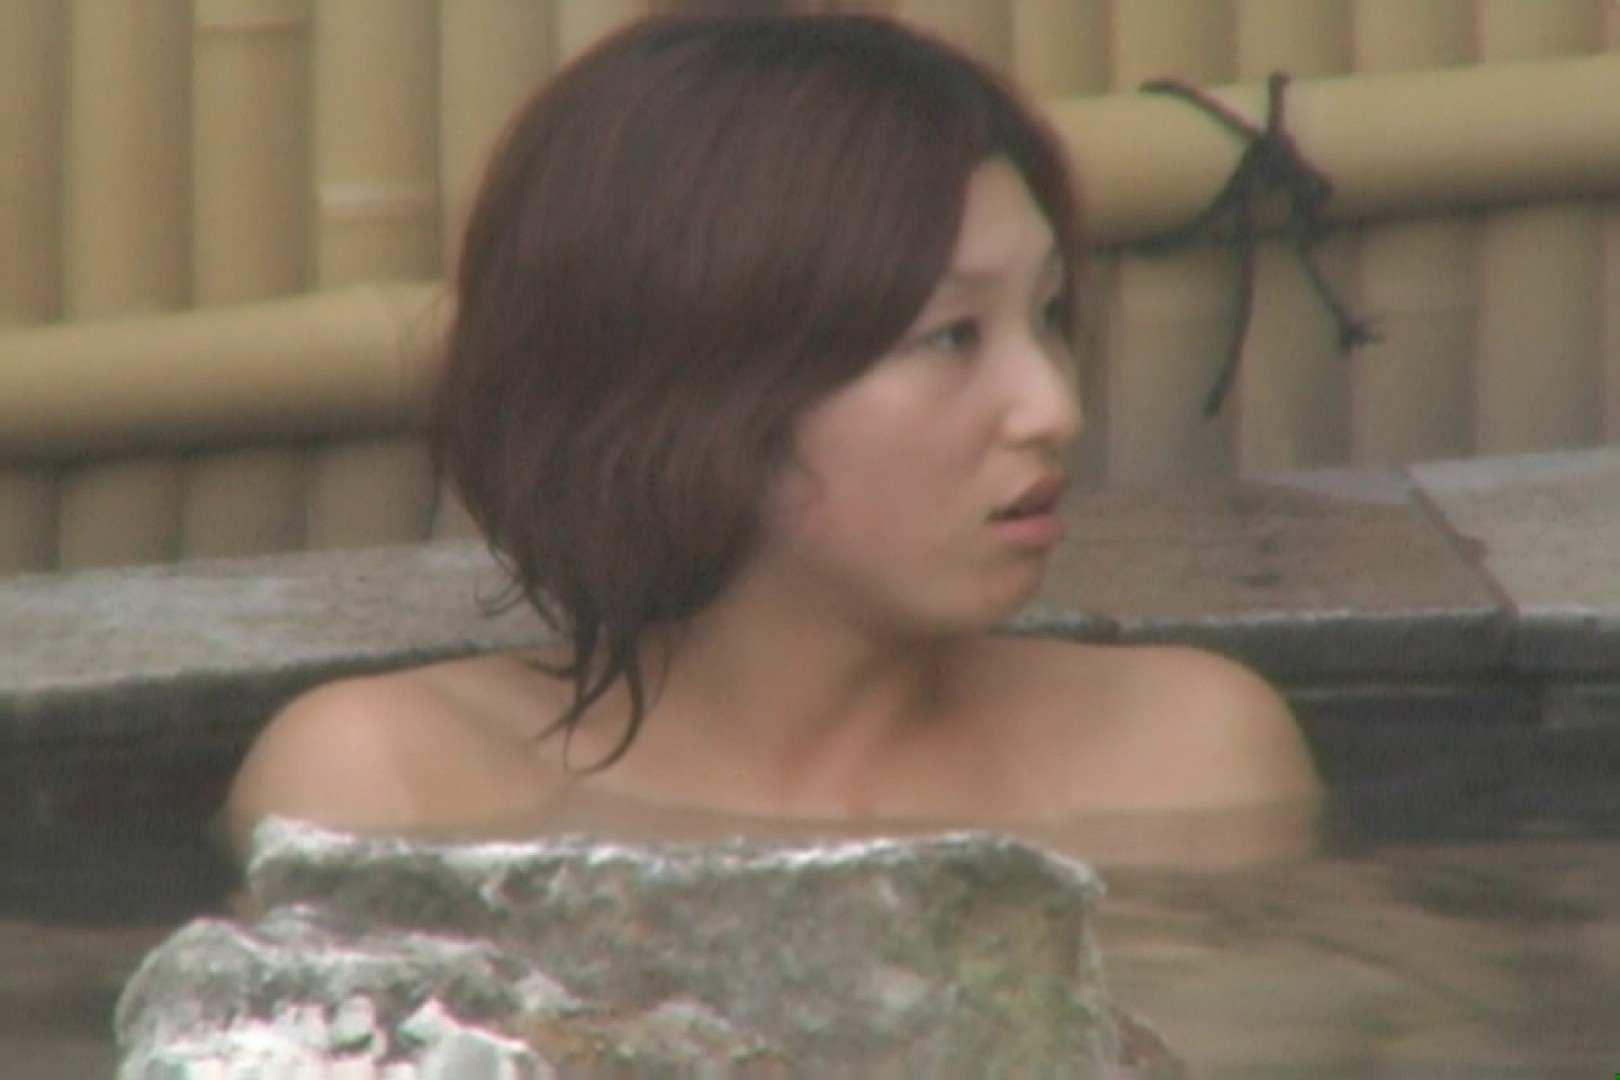 Aquaな露天風呂Vol.610 HなOL | 露天  56pic 39